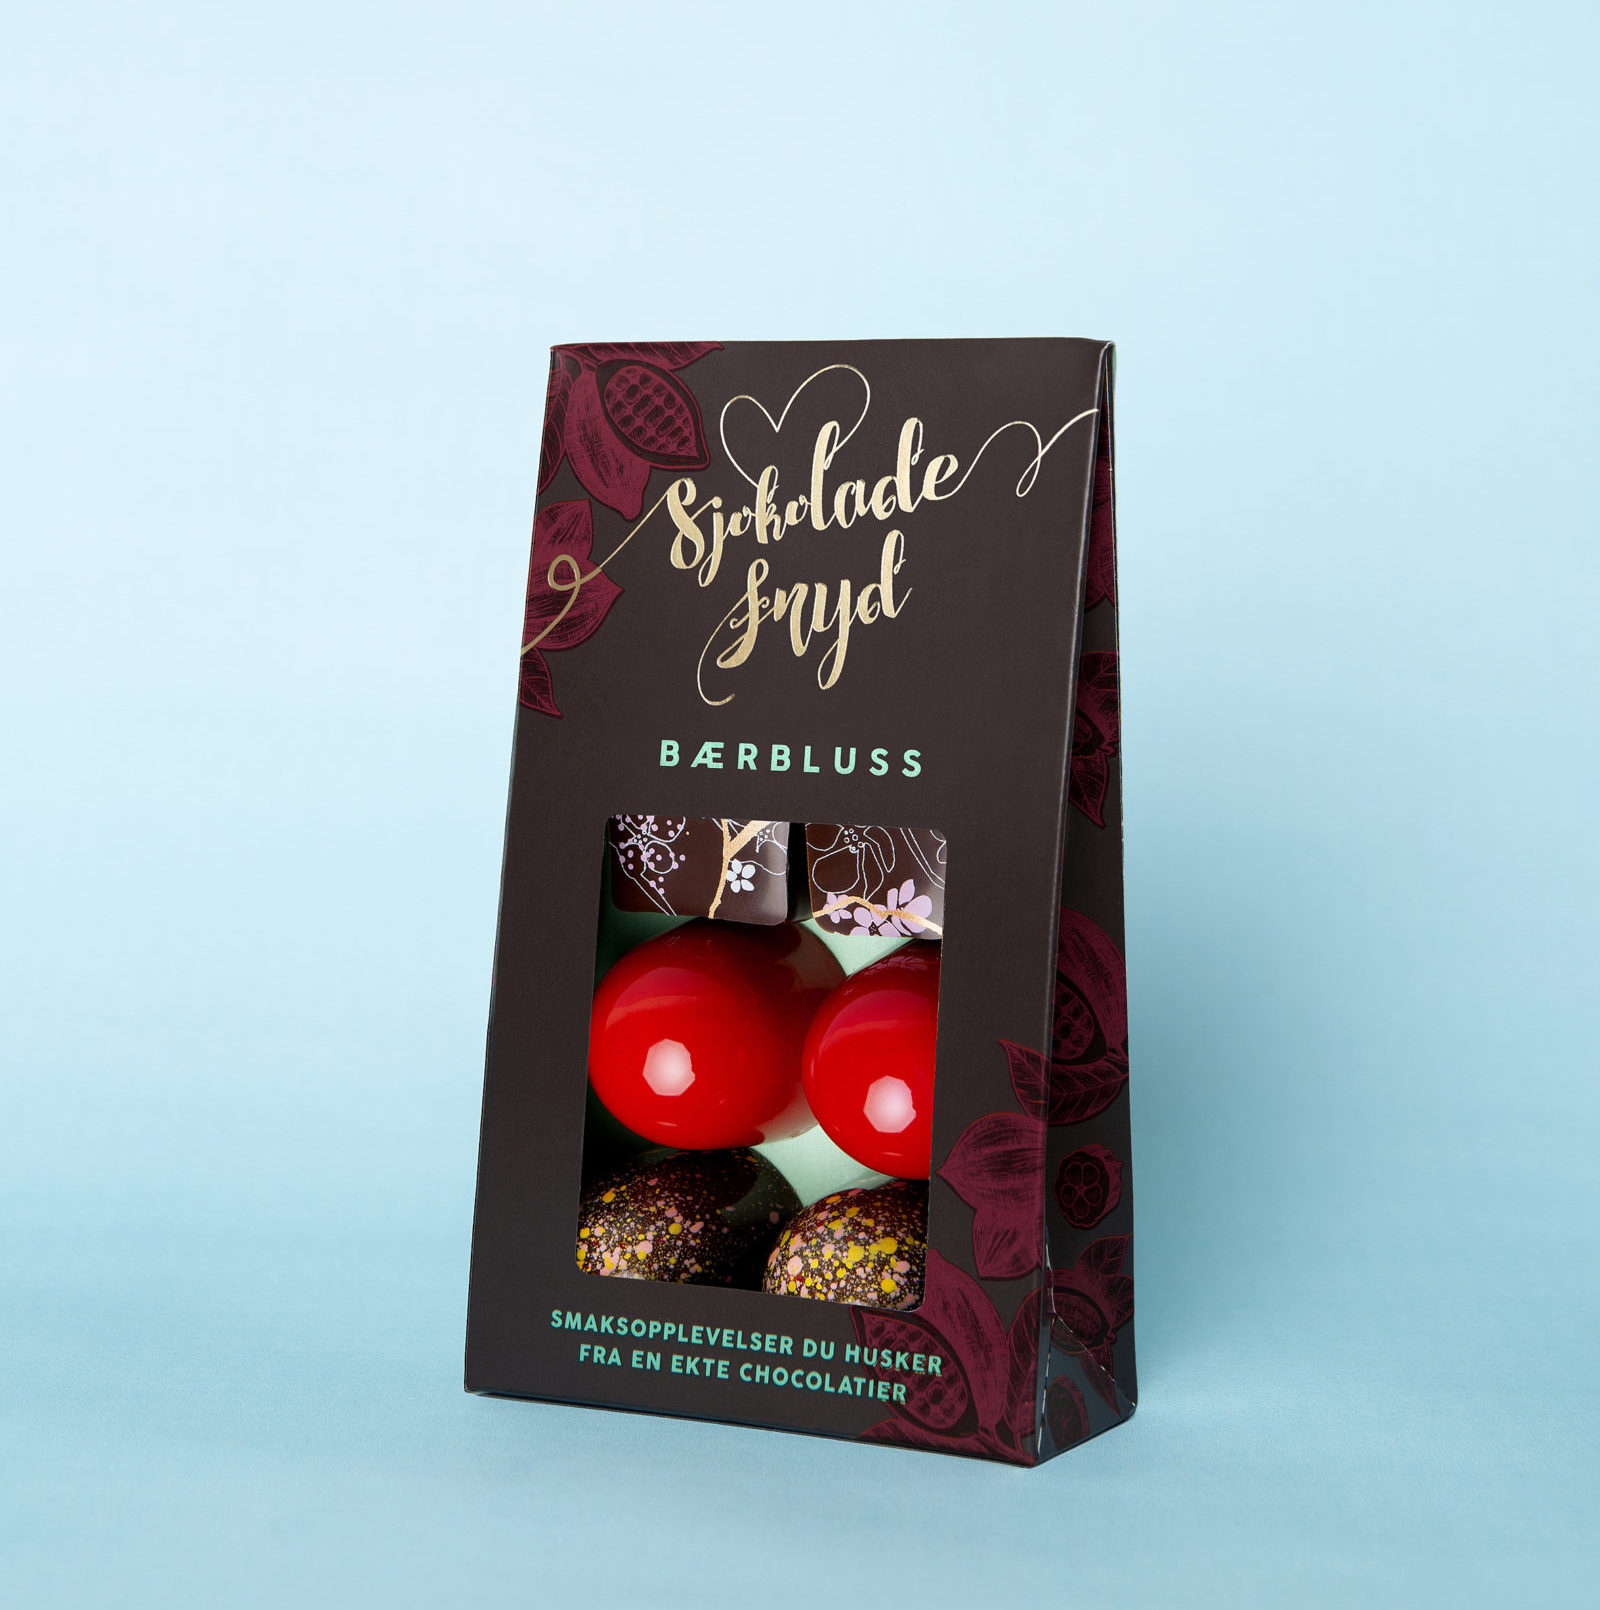 Bærbluss 6 biter Pose Sjokoladefryd